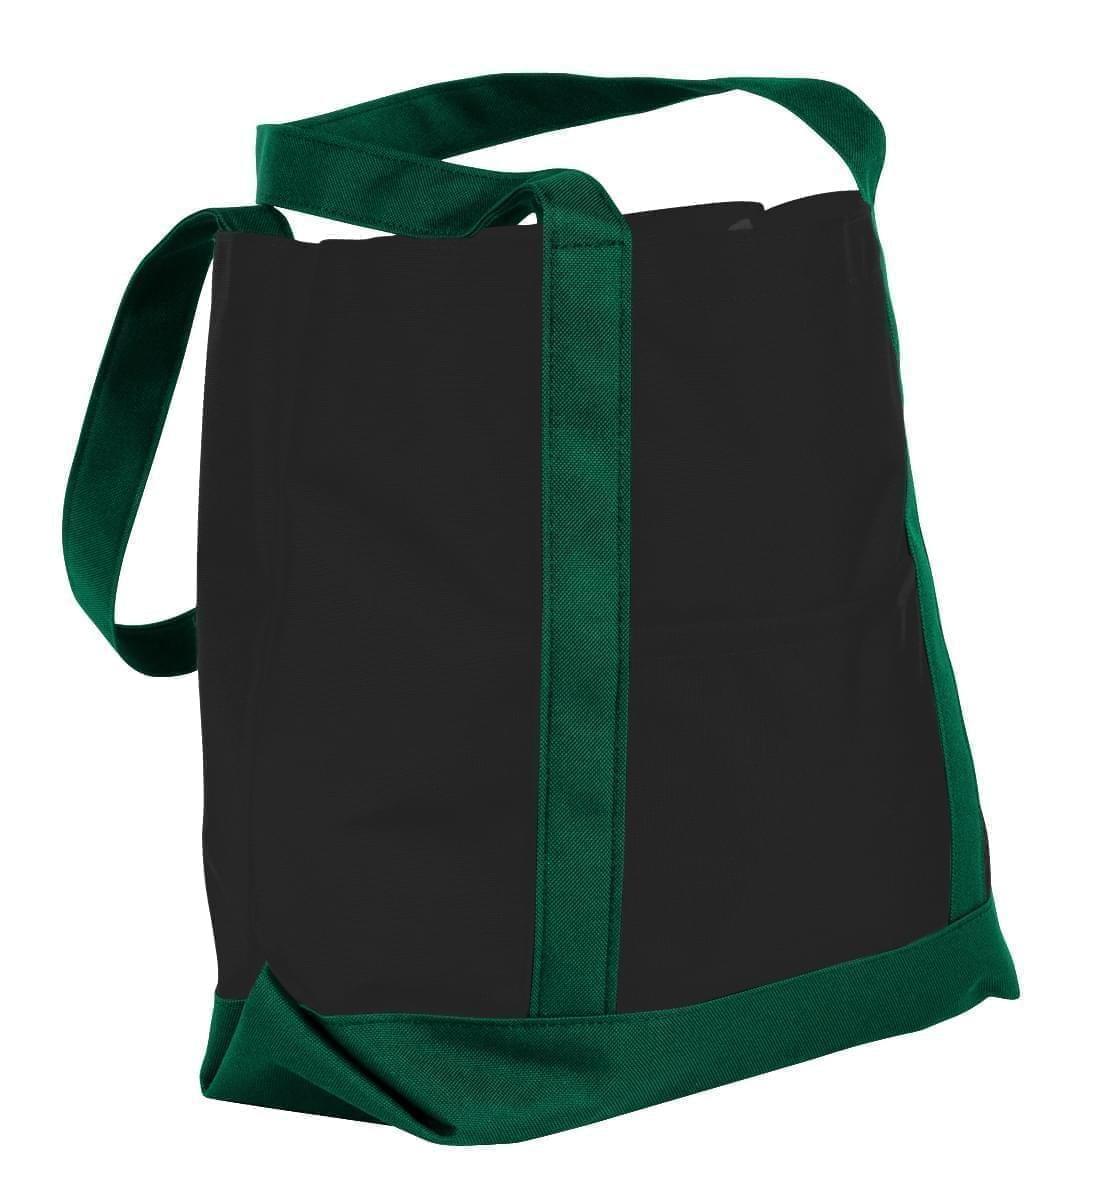 USA Made Nylon Poly Boat Tote Bags, Black-Hunter Green, XAACL1UAOV